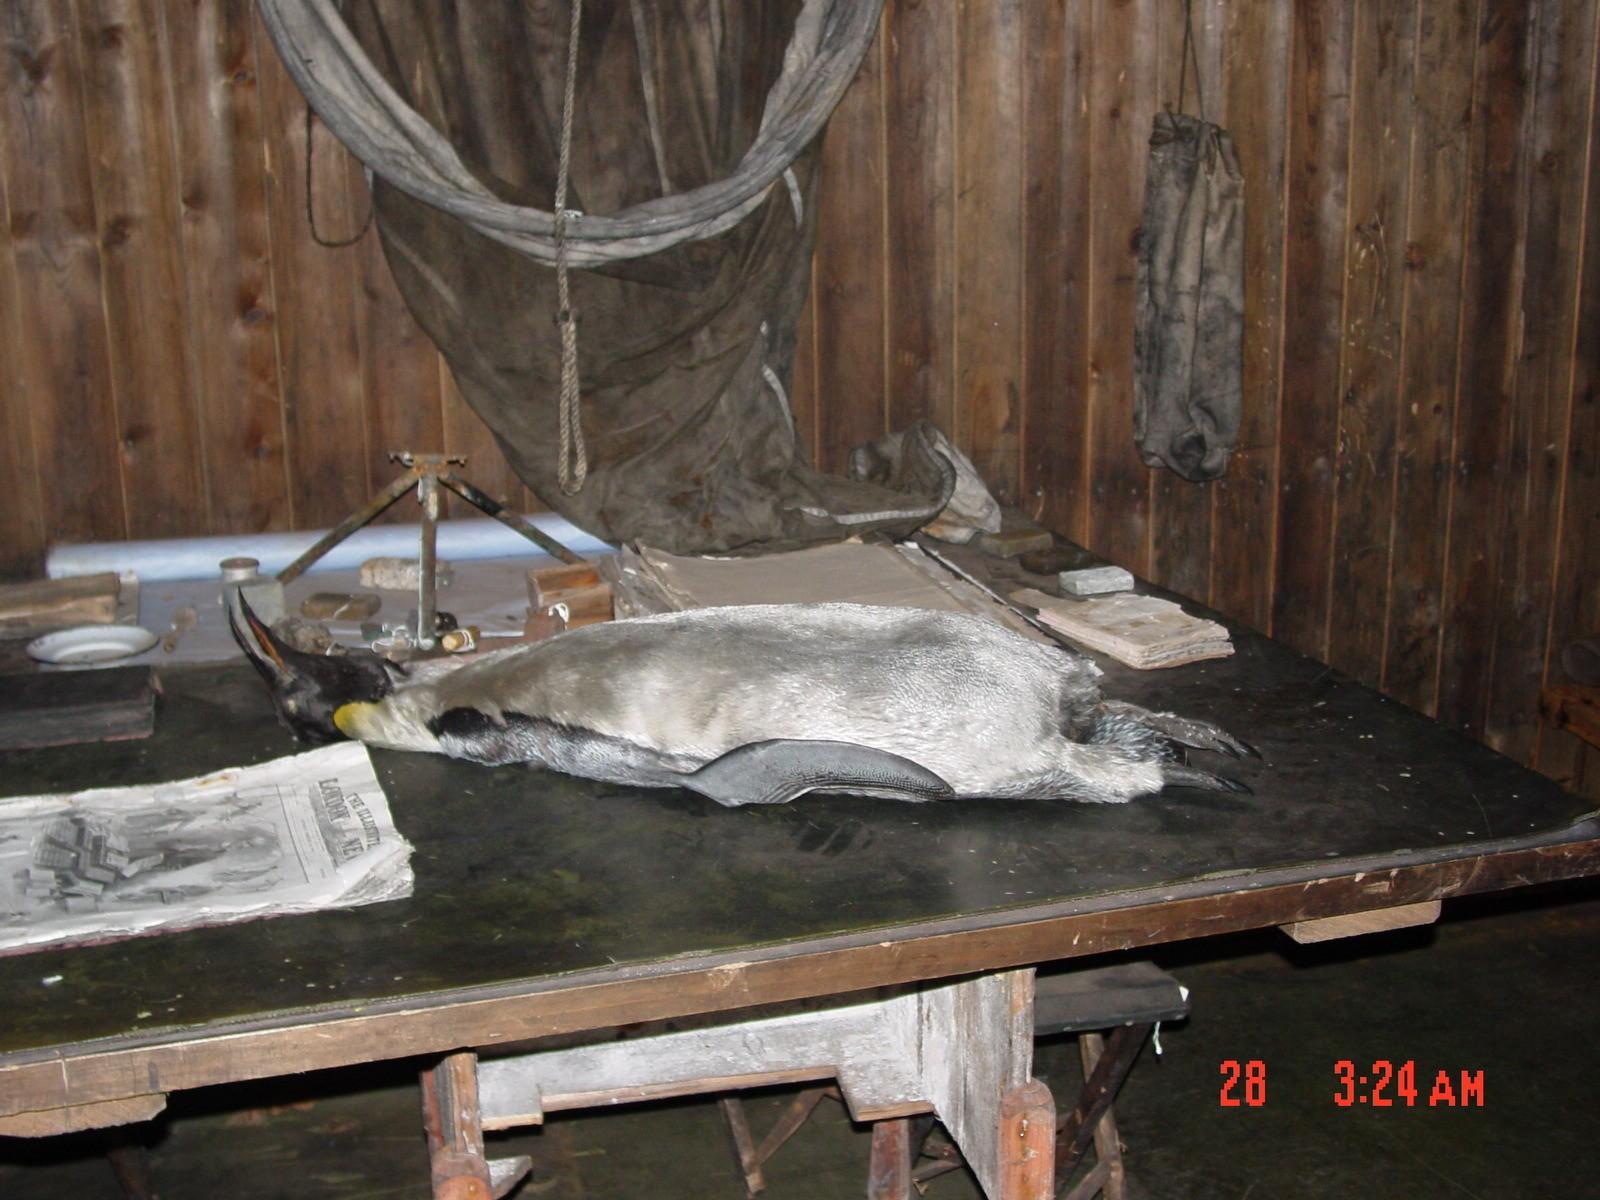 Scott's Hut, with penguin still ready for post-mortem study.